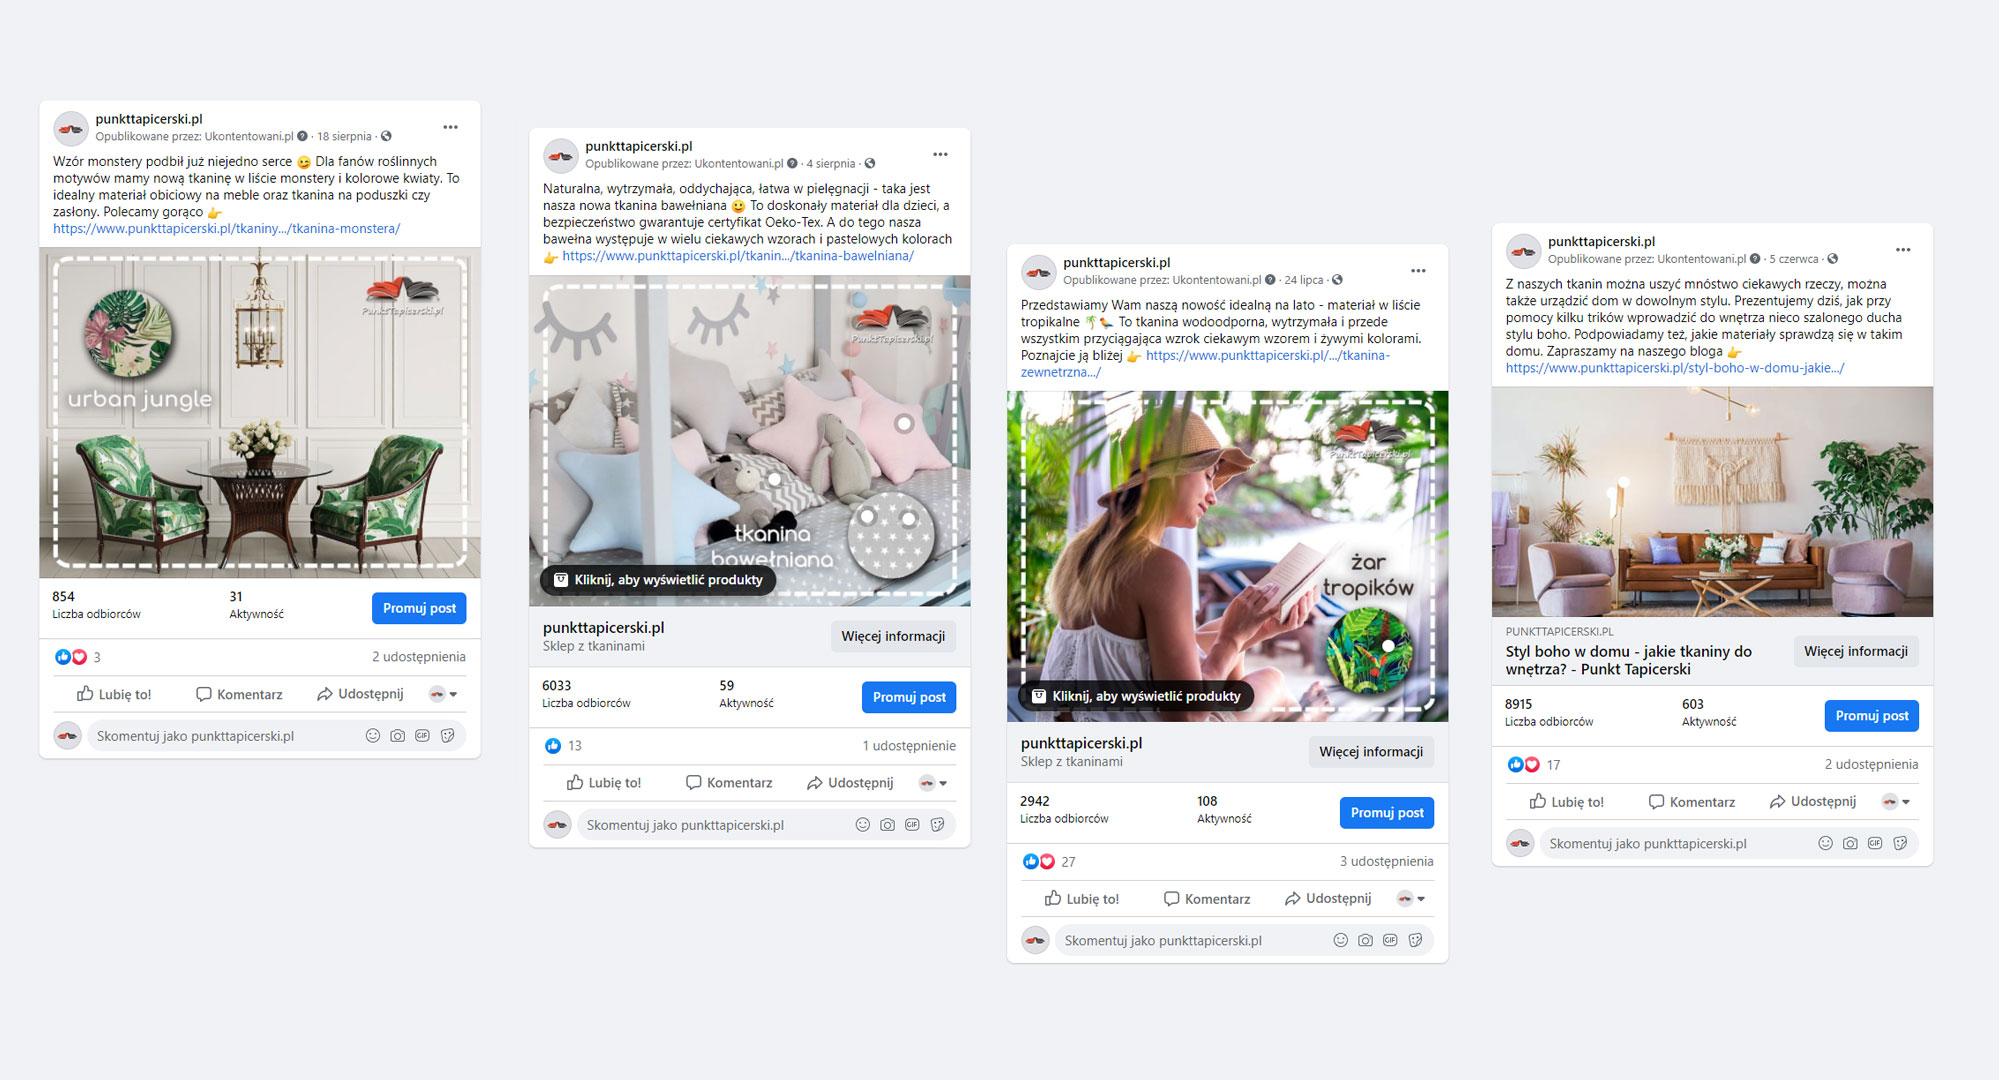 punkttapicerski-facebook